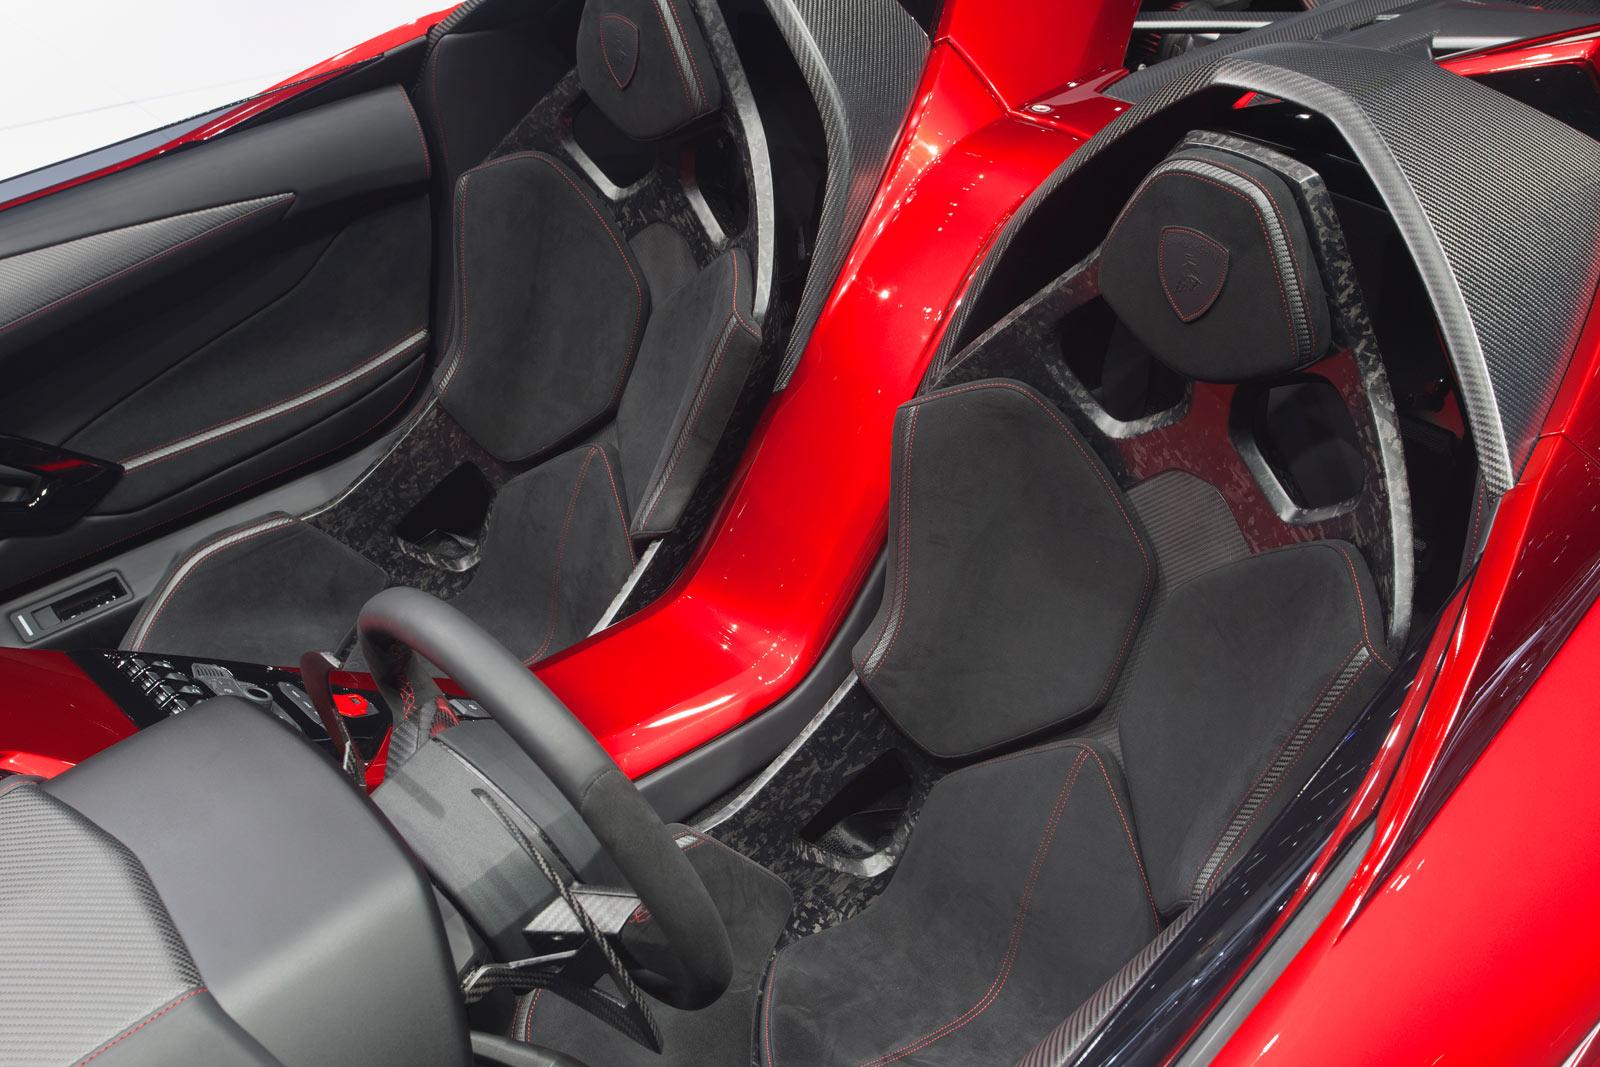 Lamborghini Aventador J - Seats - Car Design